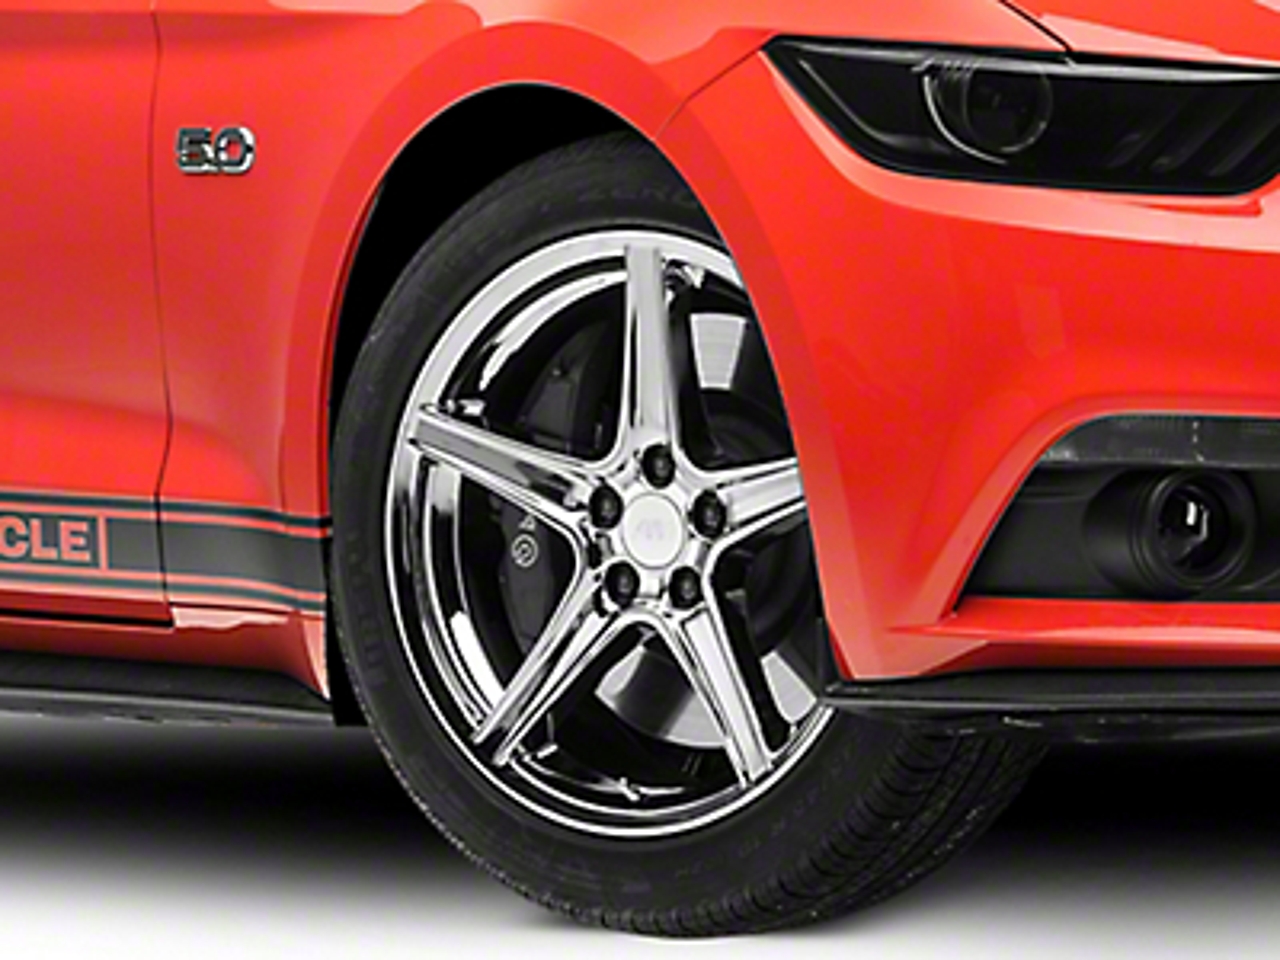 Saleen Style Chrome Wheel - 19x8.5 (15-16 V6, EcoBoost)